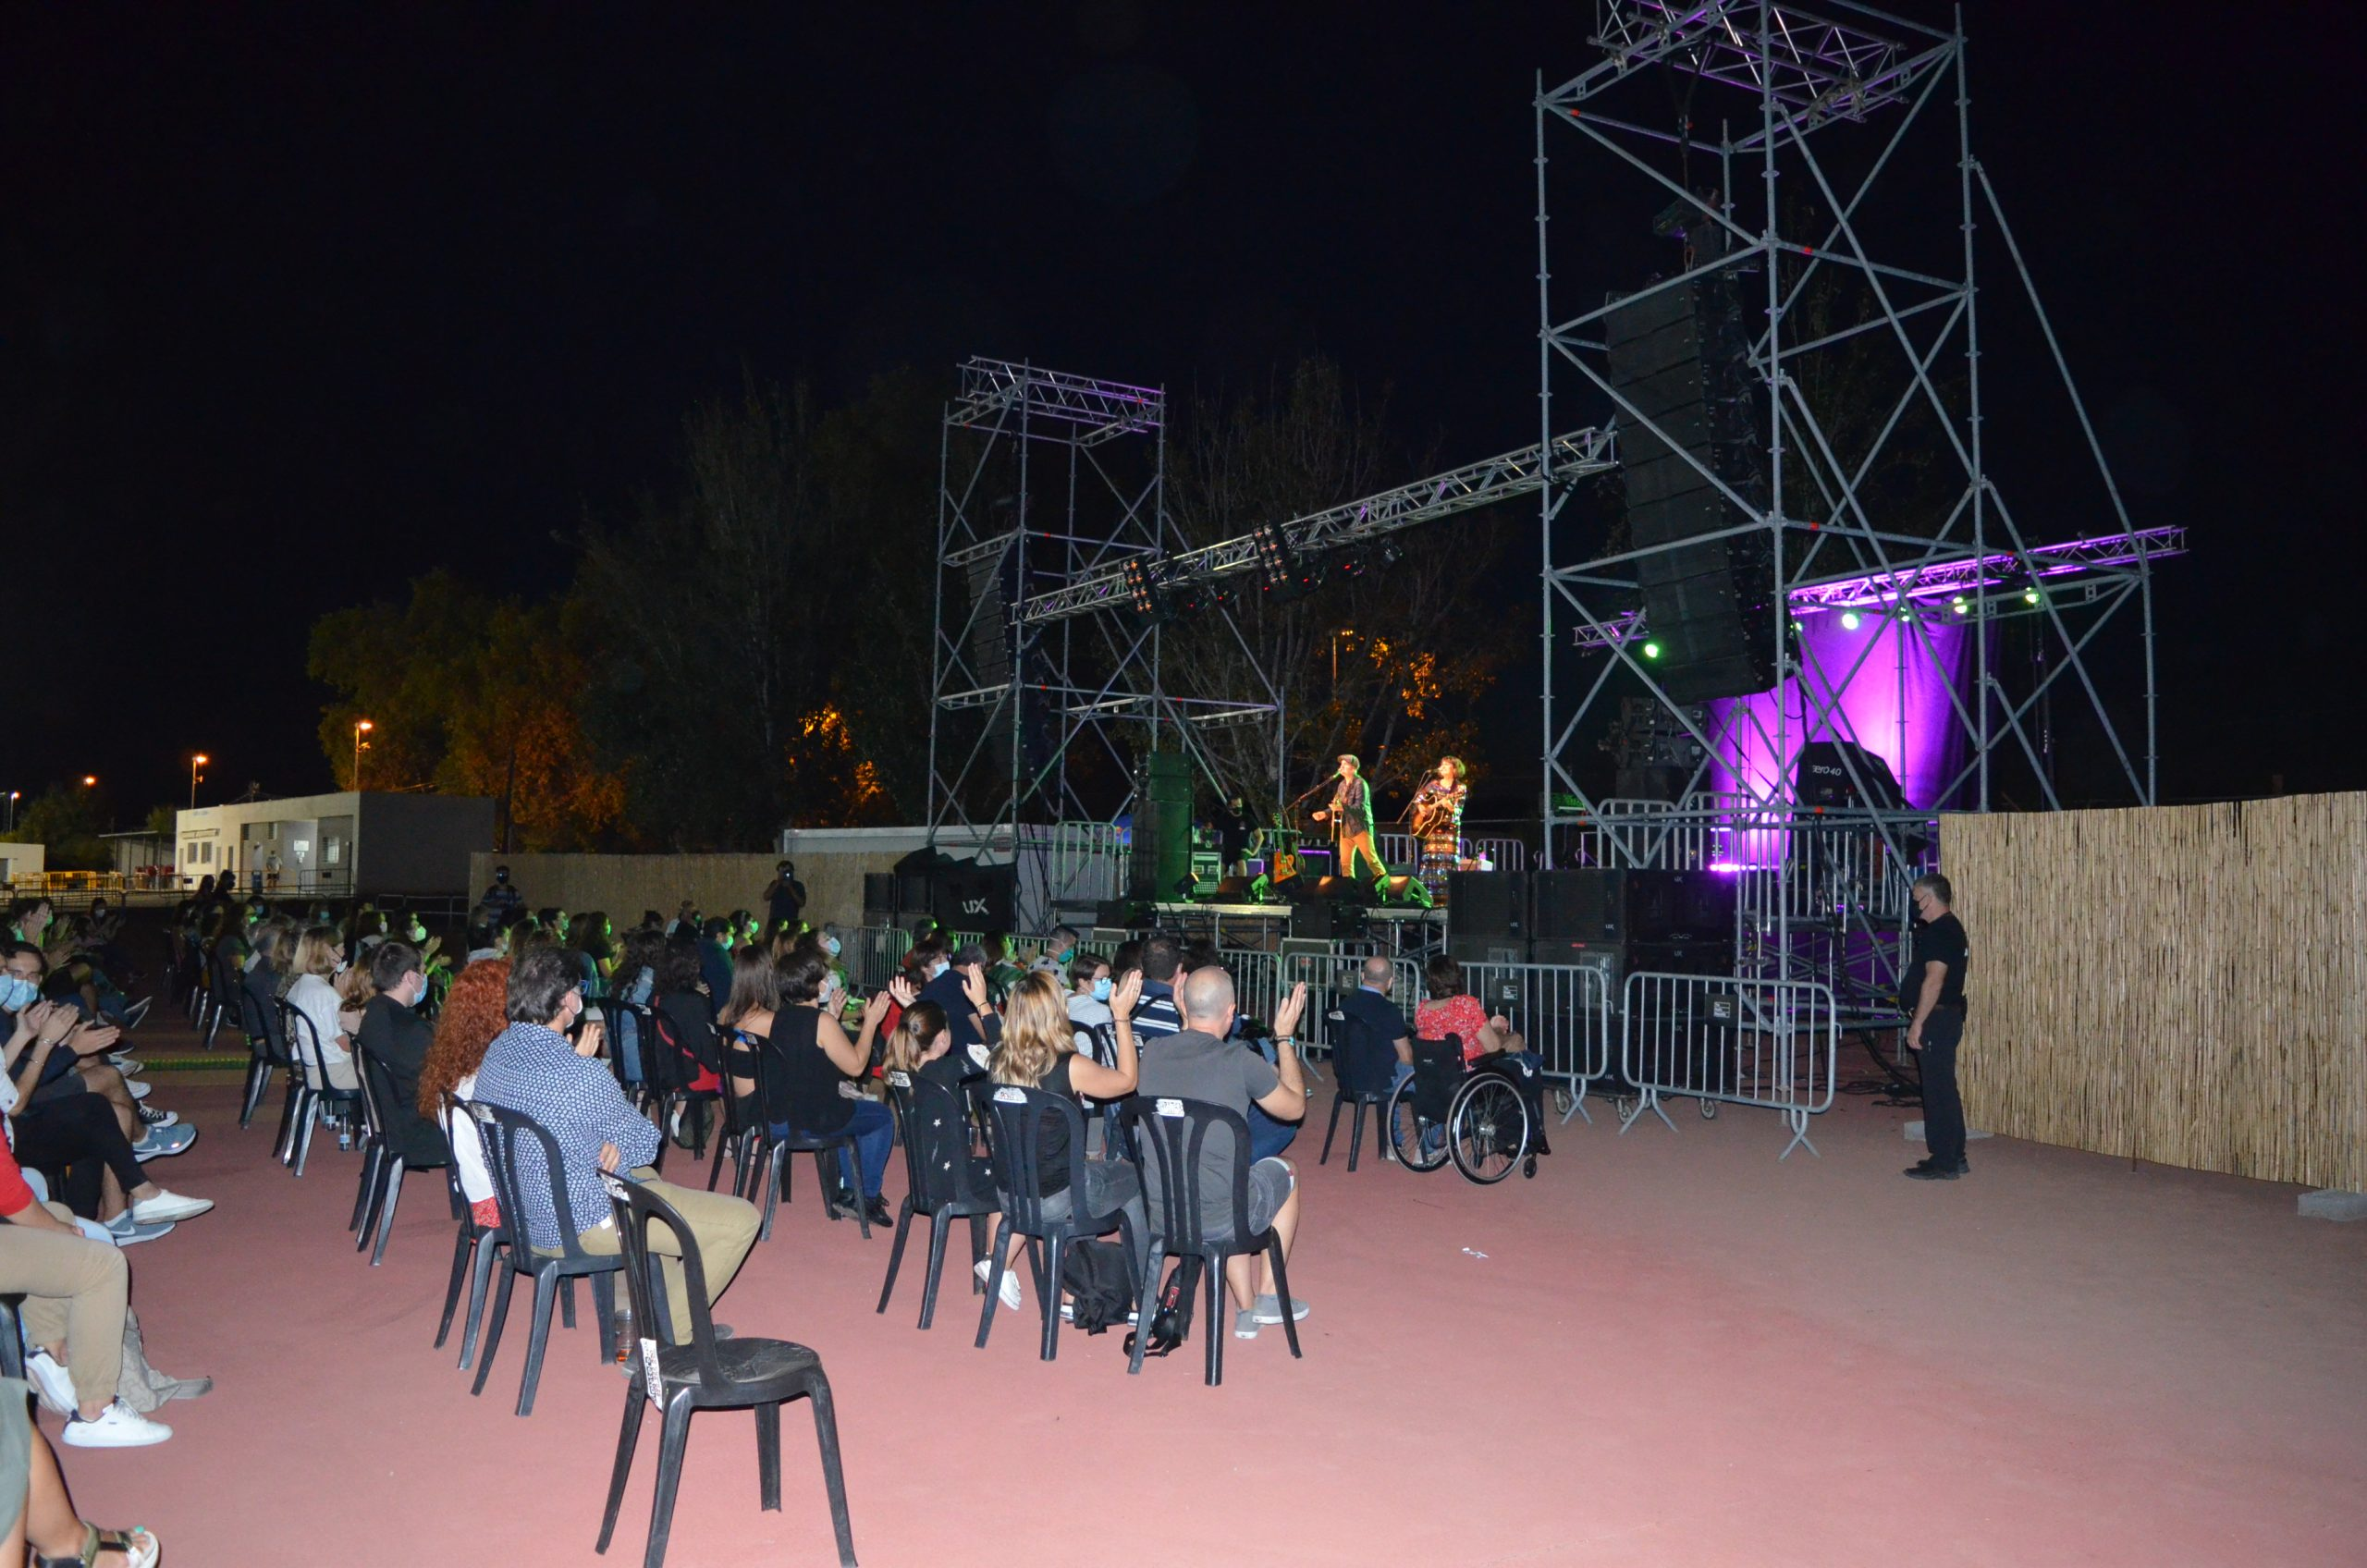 Entrevista a la concejala de Fiestas de Burriana, Lluïsa Monferrer